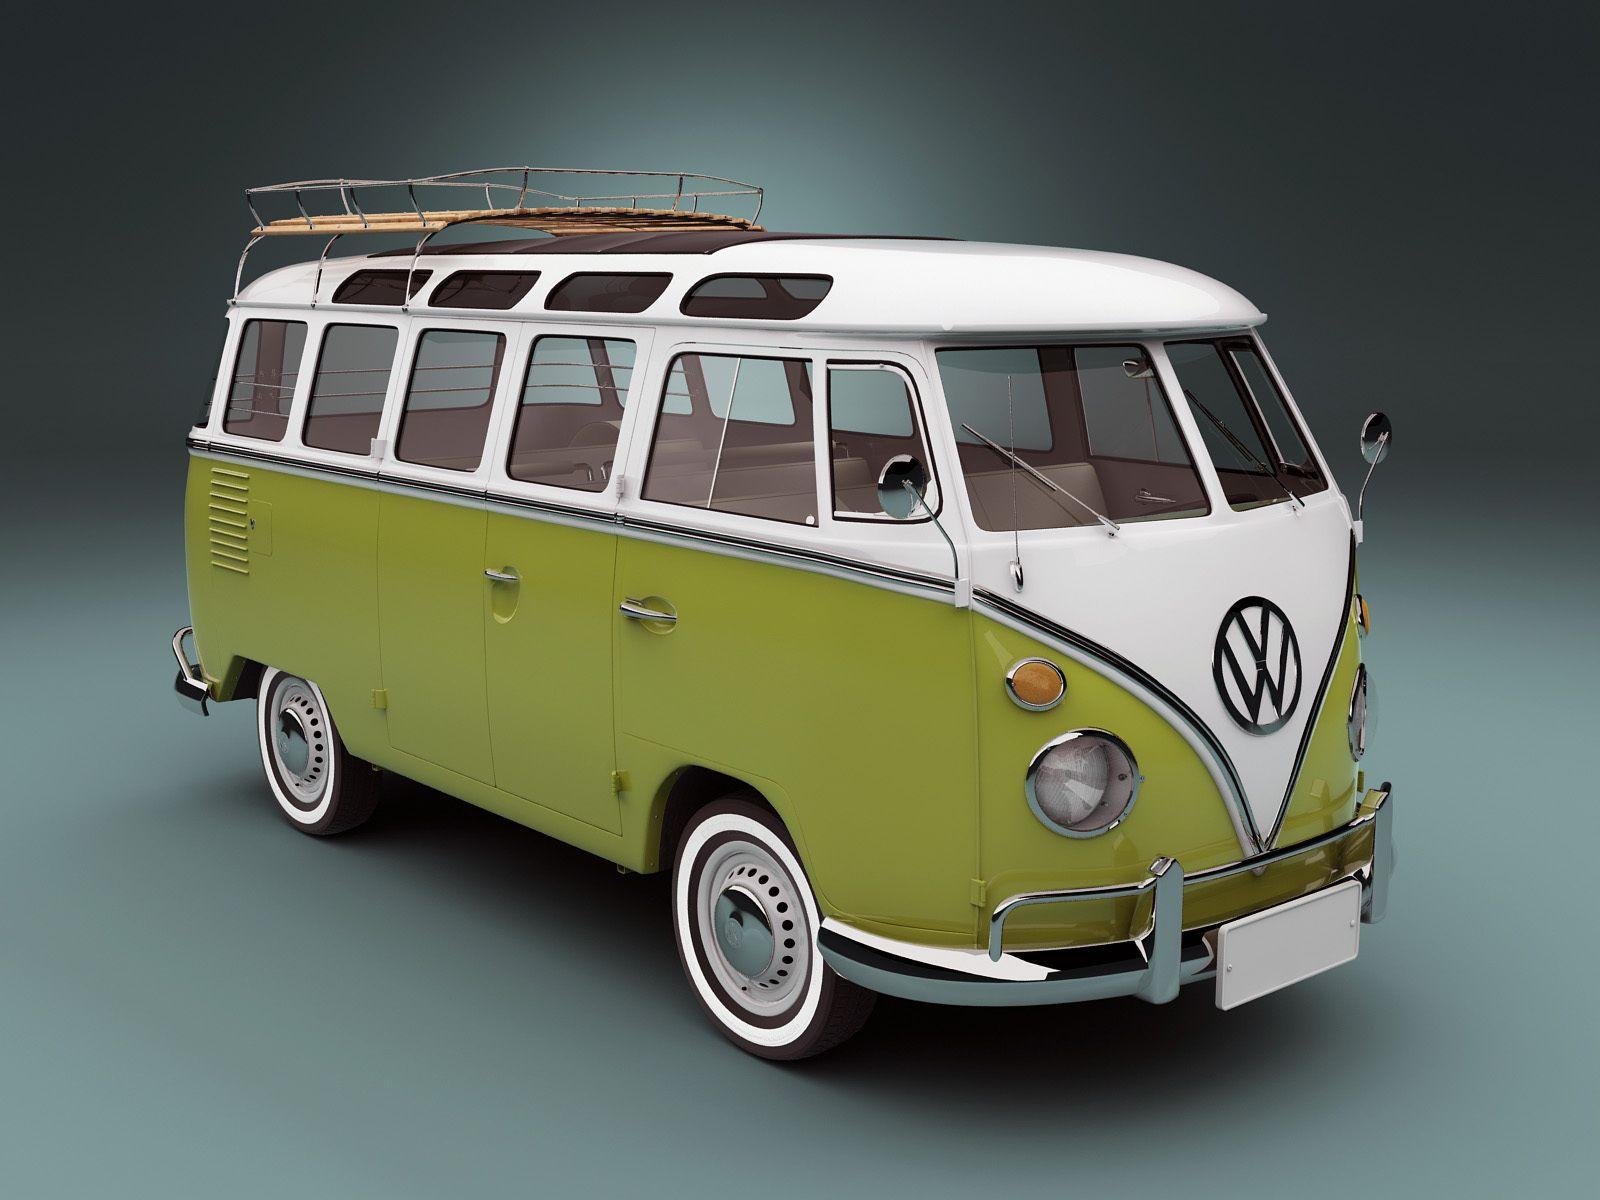 volkswagen bulli t1 samba bus vwt1 pinterest. Black Bedroom Furniture Sets. Home Design Ideas